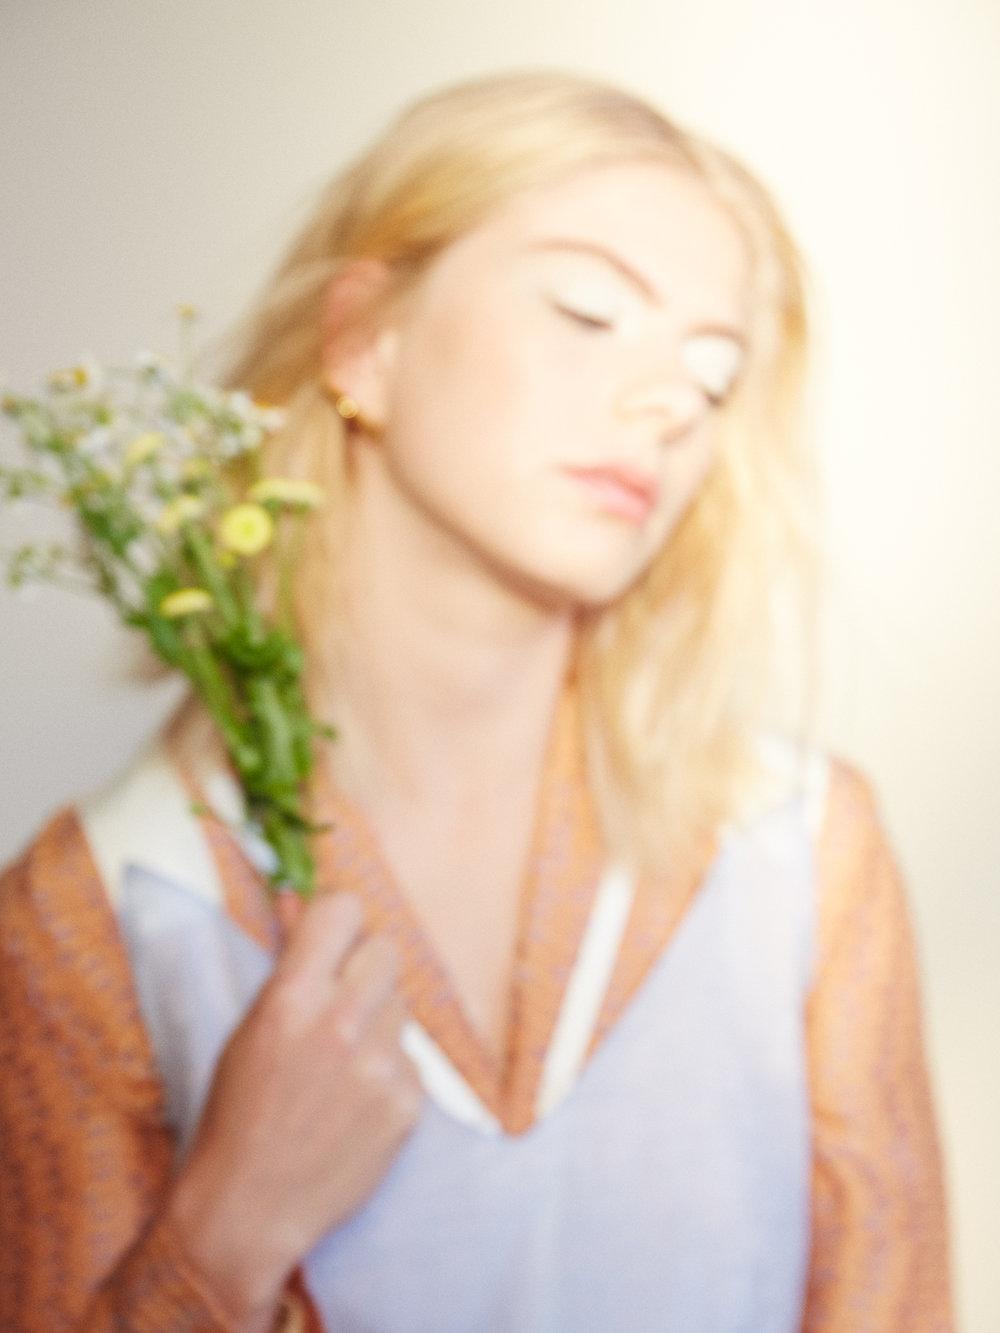 Photographer Kat Slootsky for Ravelin Magazine